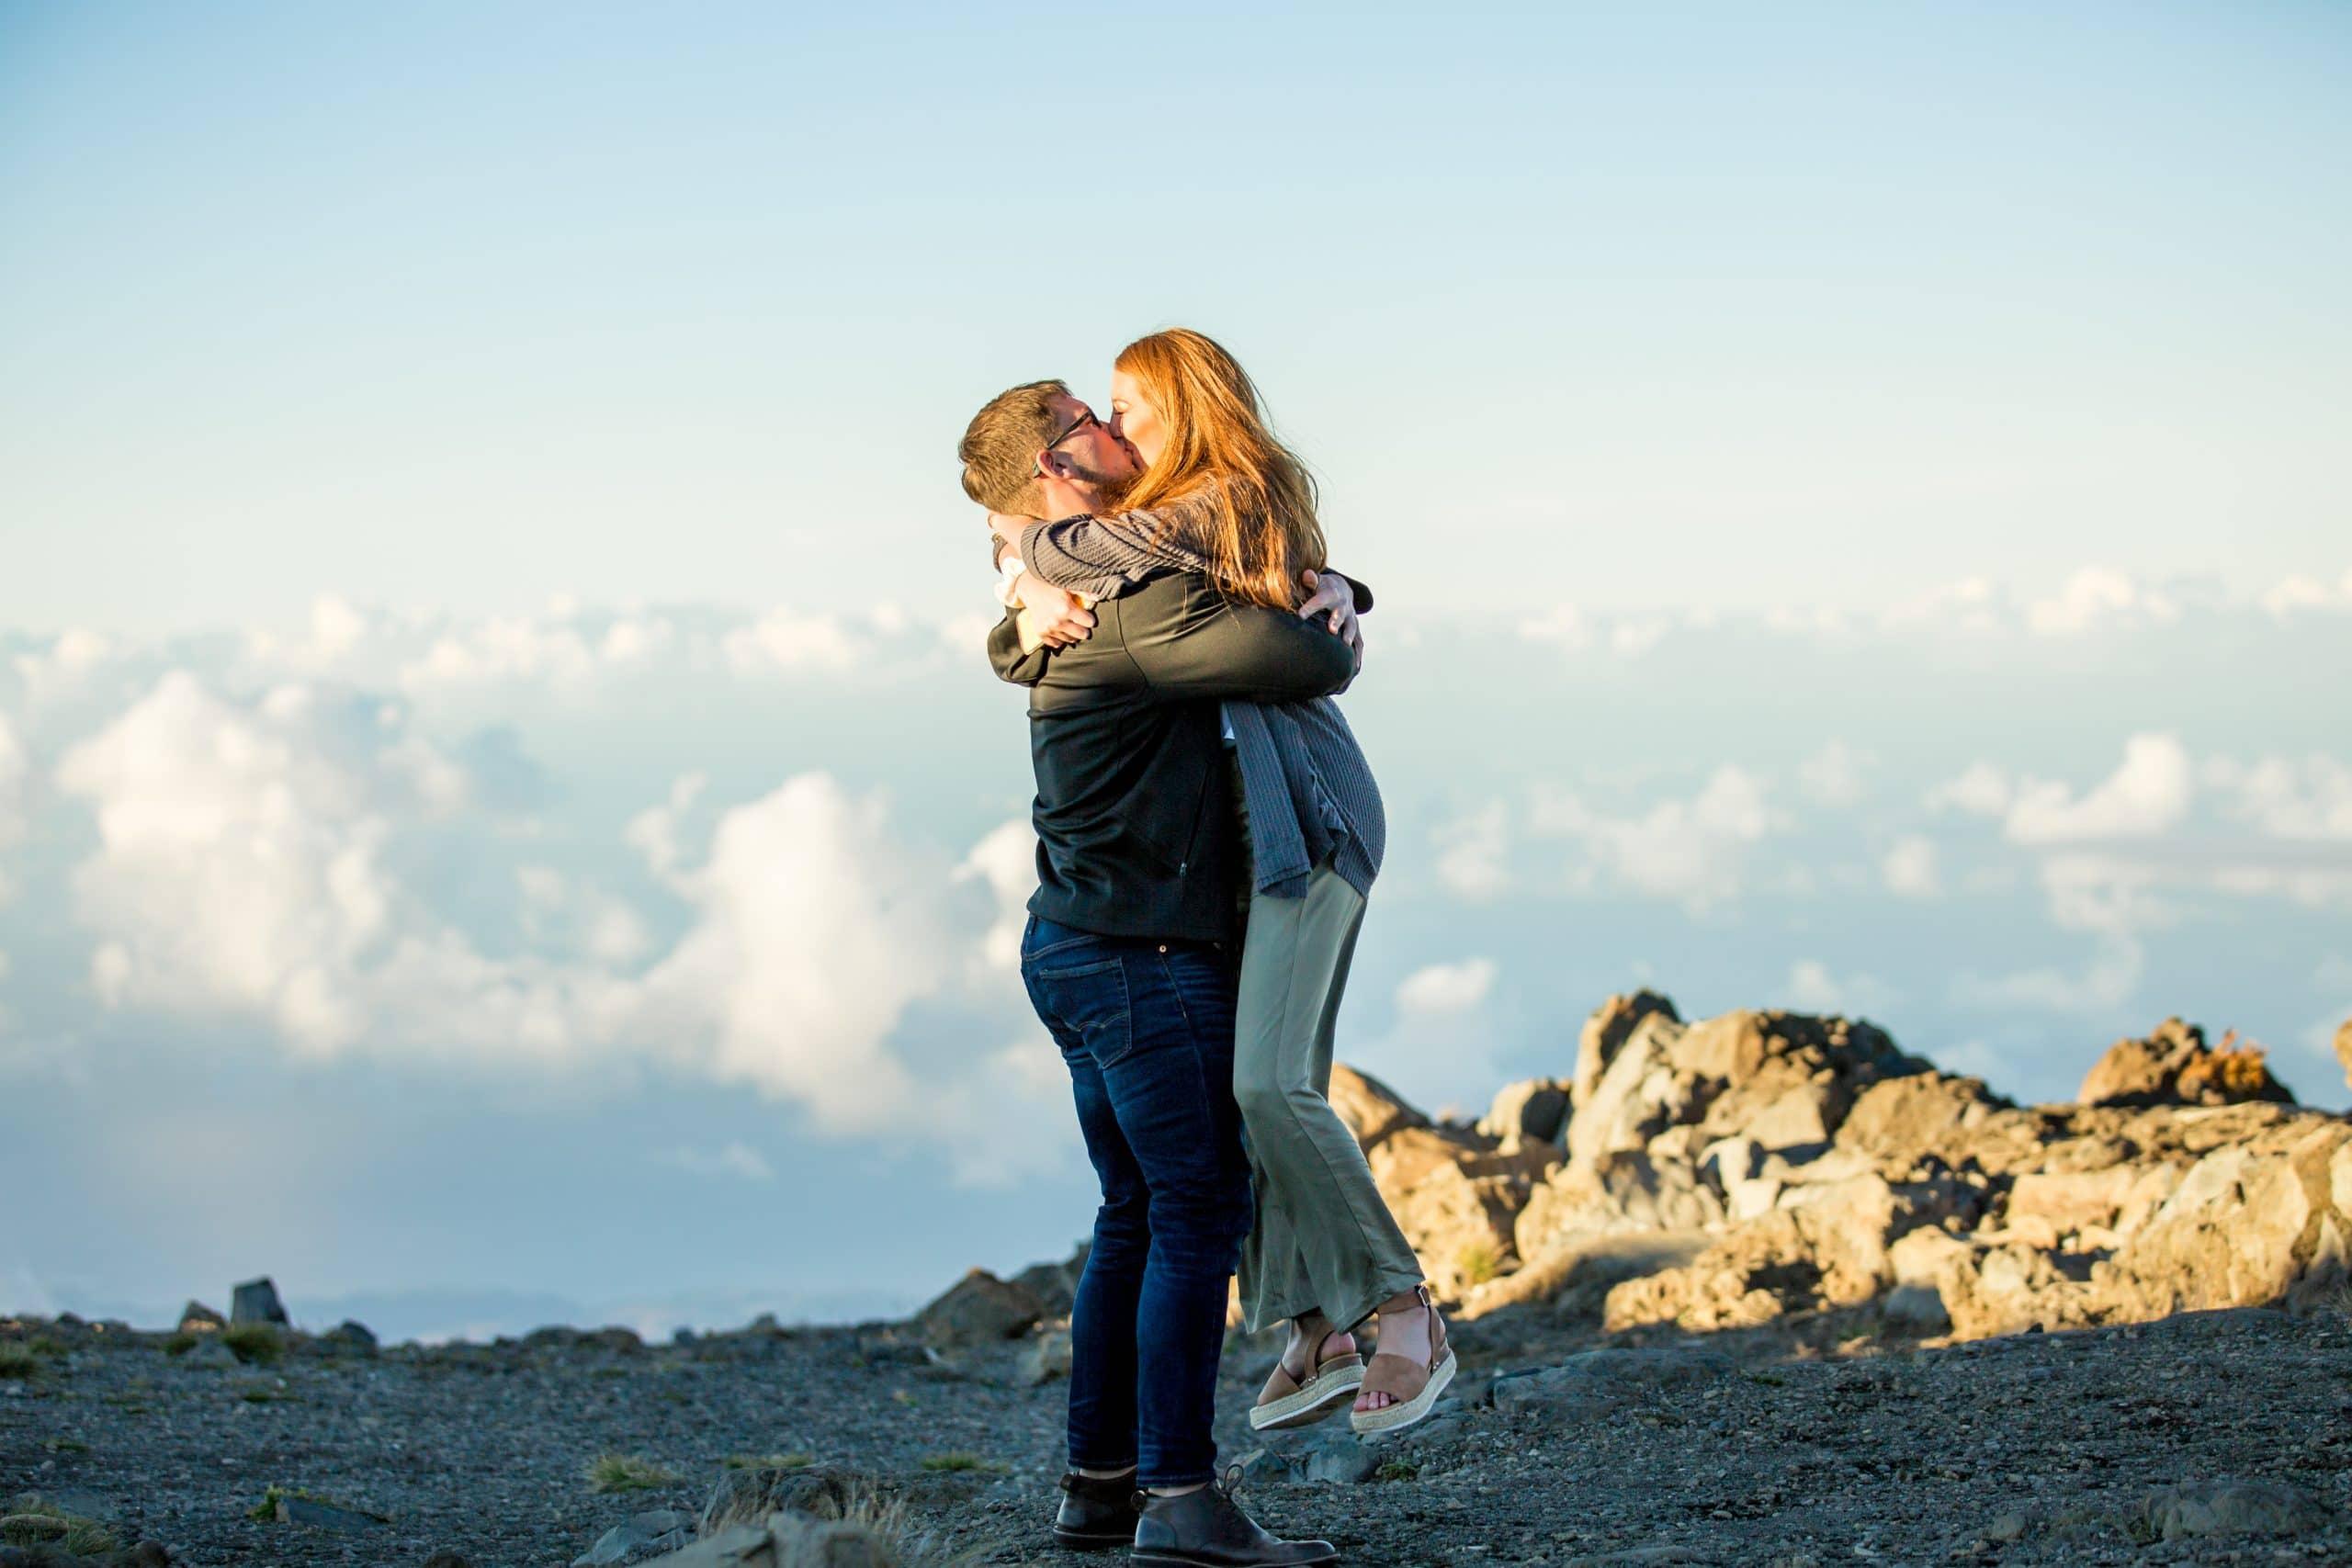 Proposal ideas | How to plan a proposal | Proposal pictures | Beach proposal | Beach proposal ideas | Proposal | Hawaii proposal | Maui Proposal | Maui proposal ideas | Hawaii Engagement Photographer | Maui Engagement Photographer | Engaged on Maui